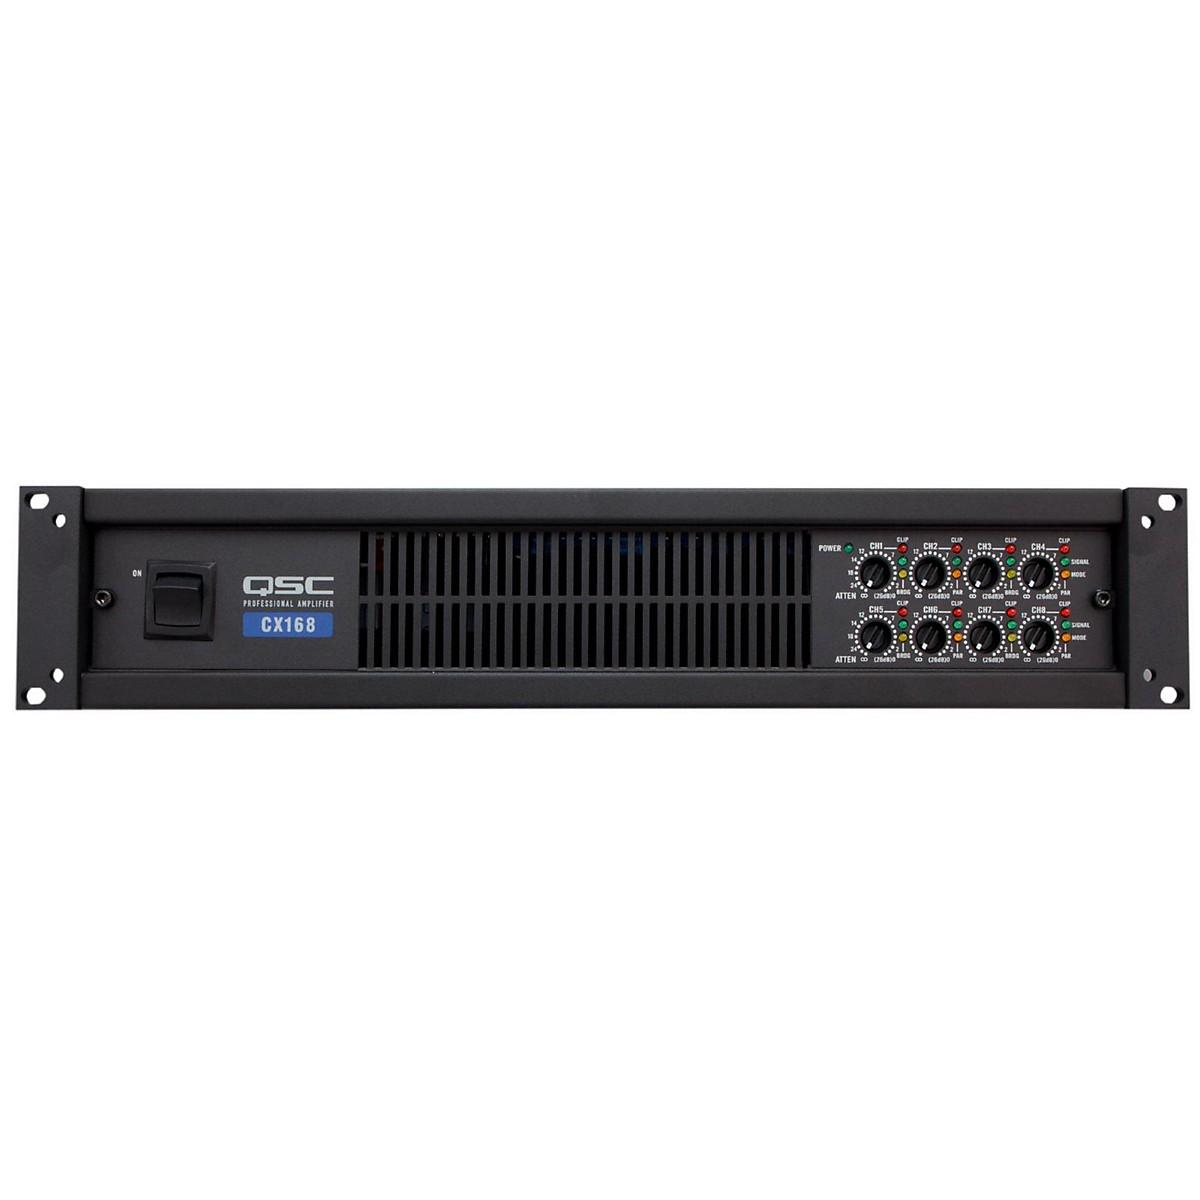 QSC CX168 8-CH Low-Z Power Amplifier